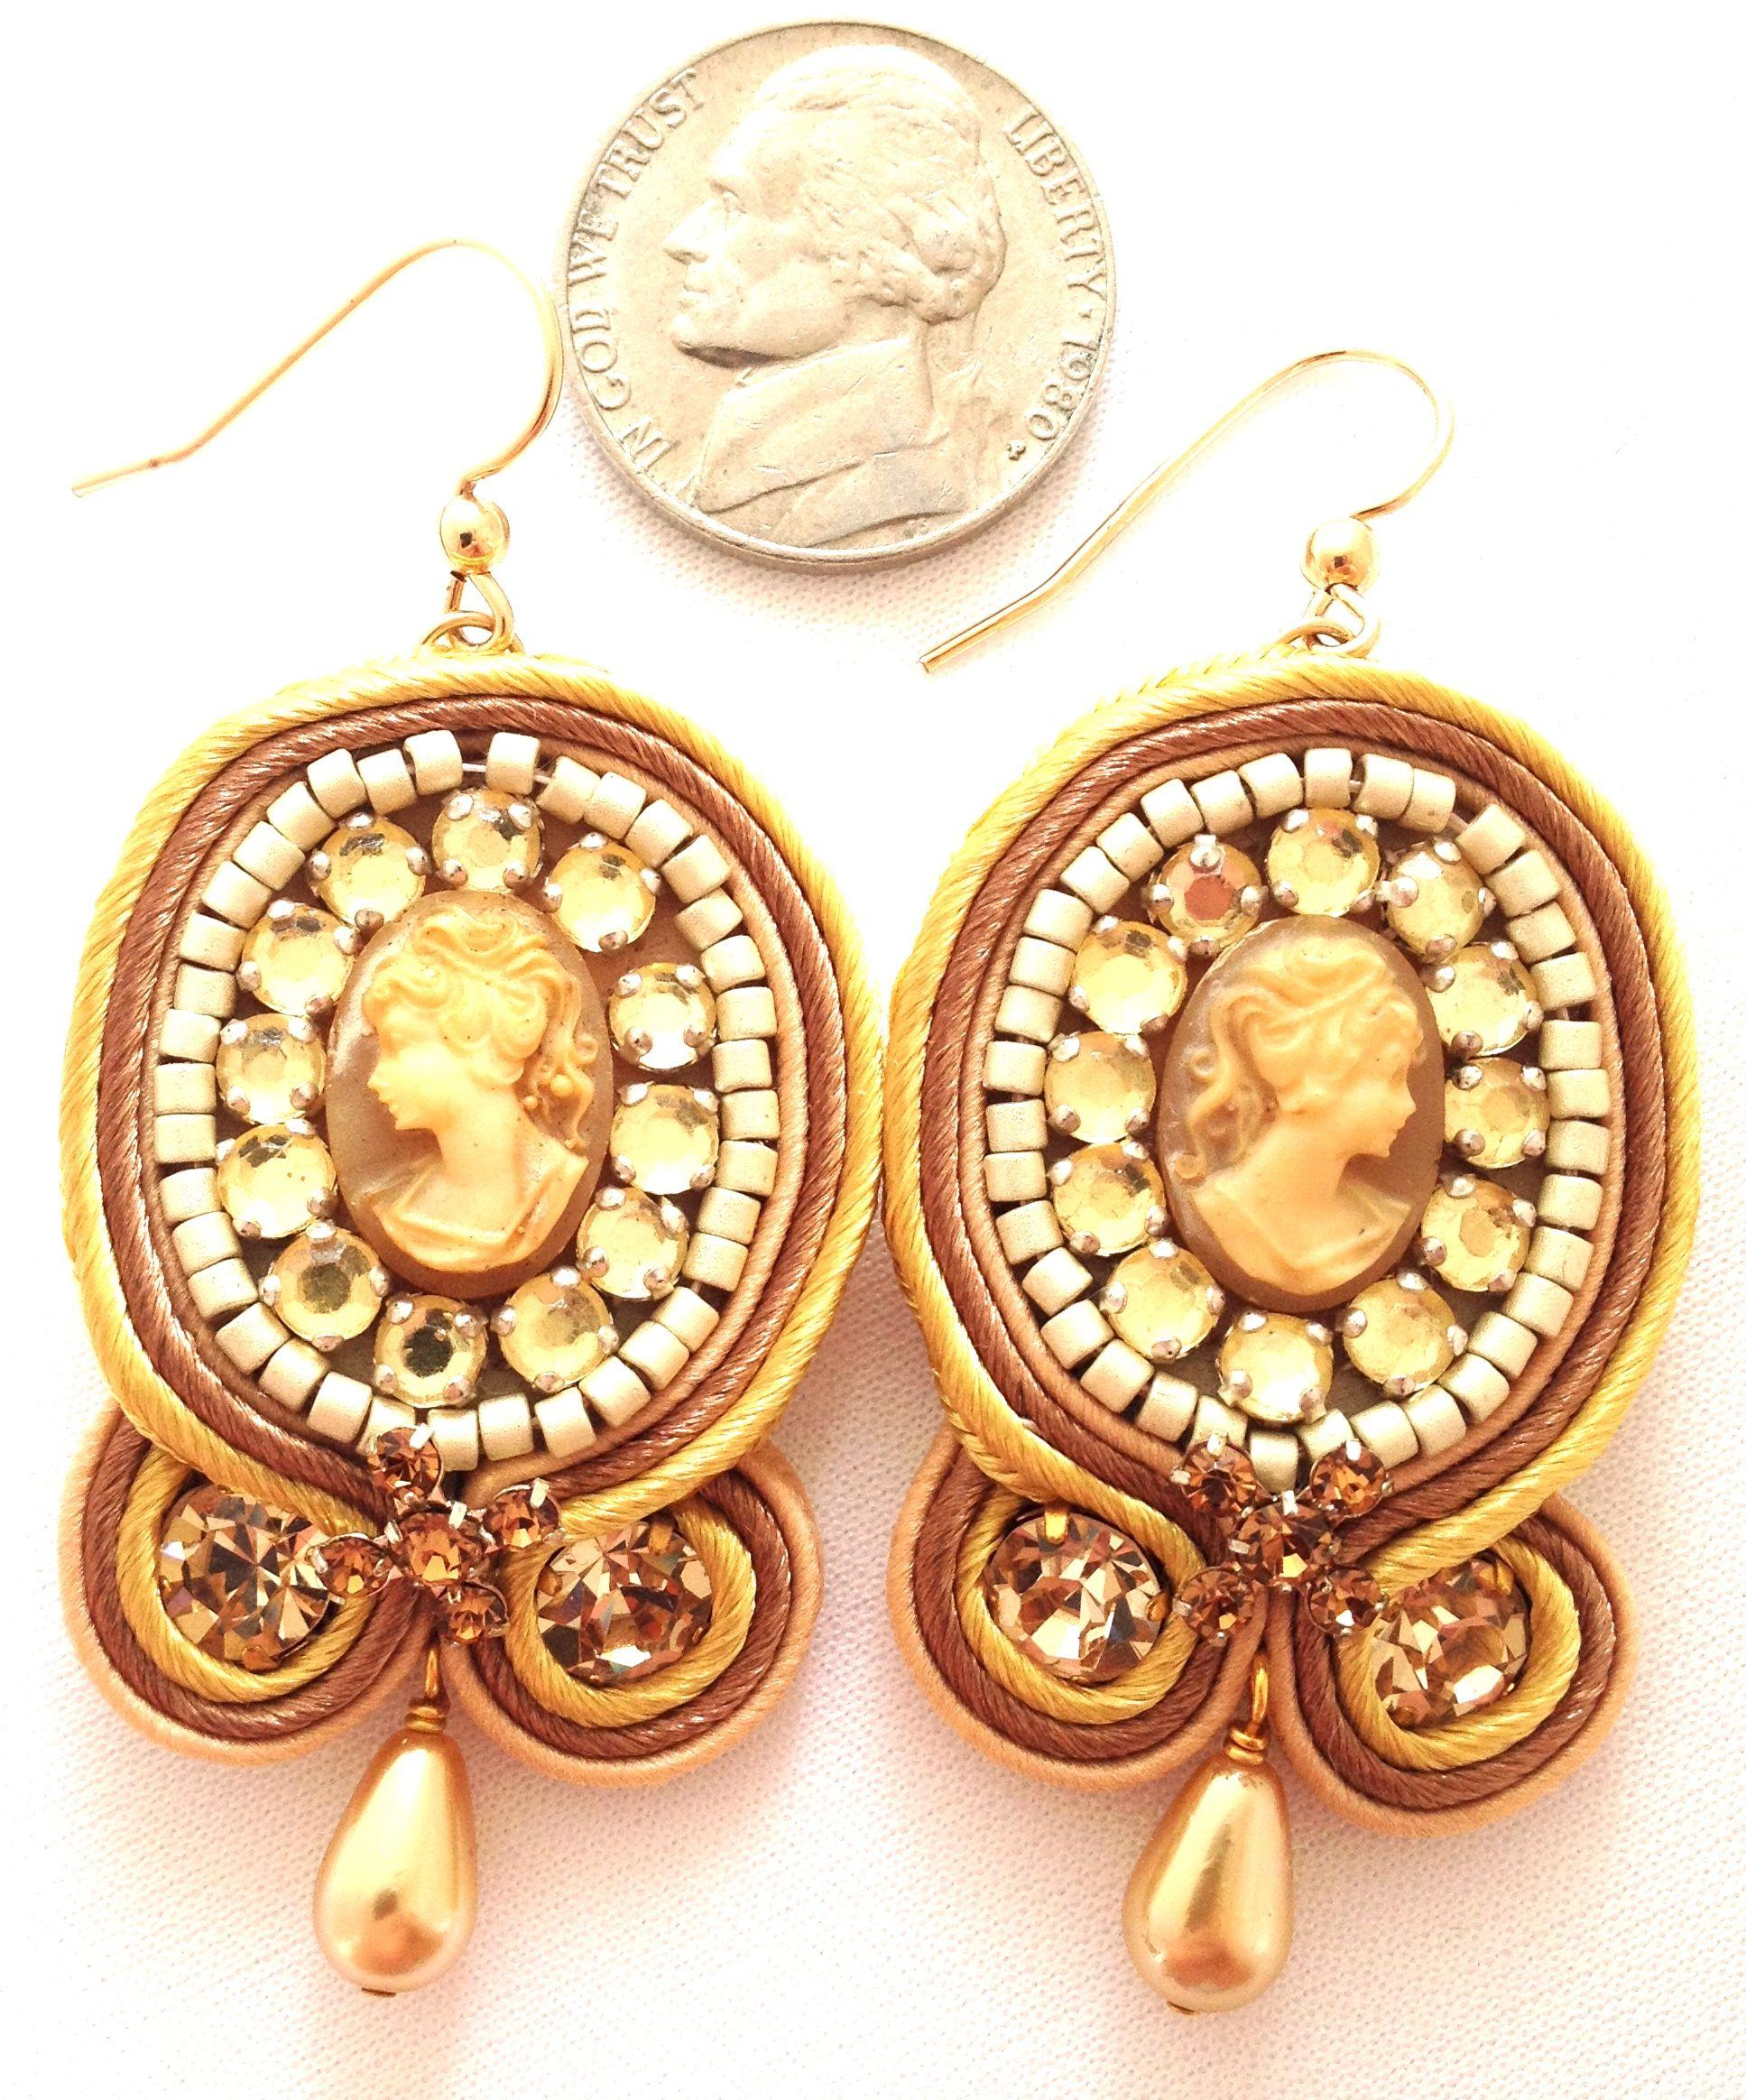 soutache jewelry | ... Soutache Jewelry / Soutache Earrings / Miss Barrett Cameo Soutache